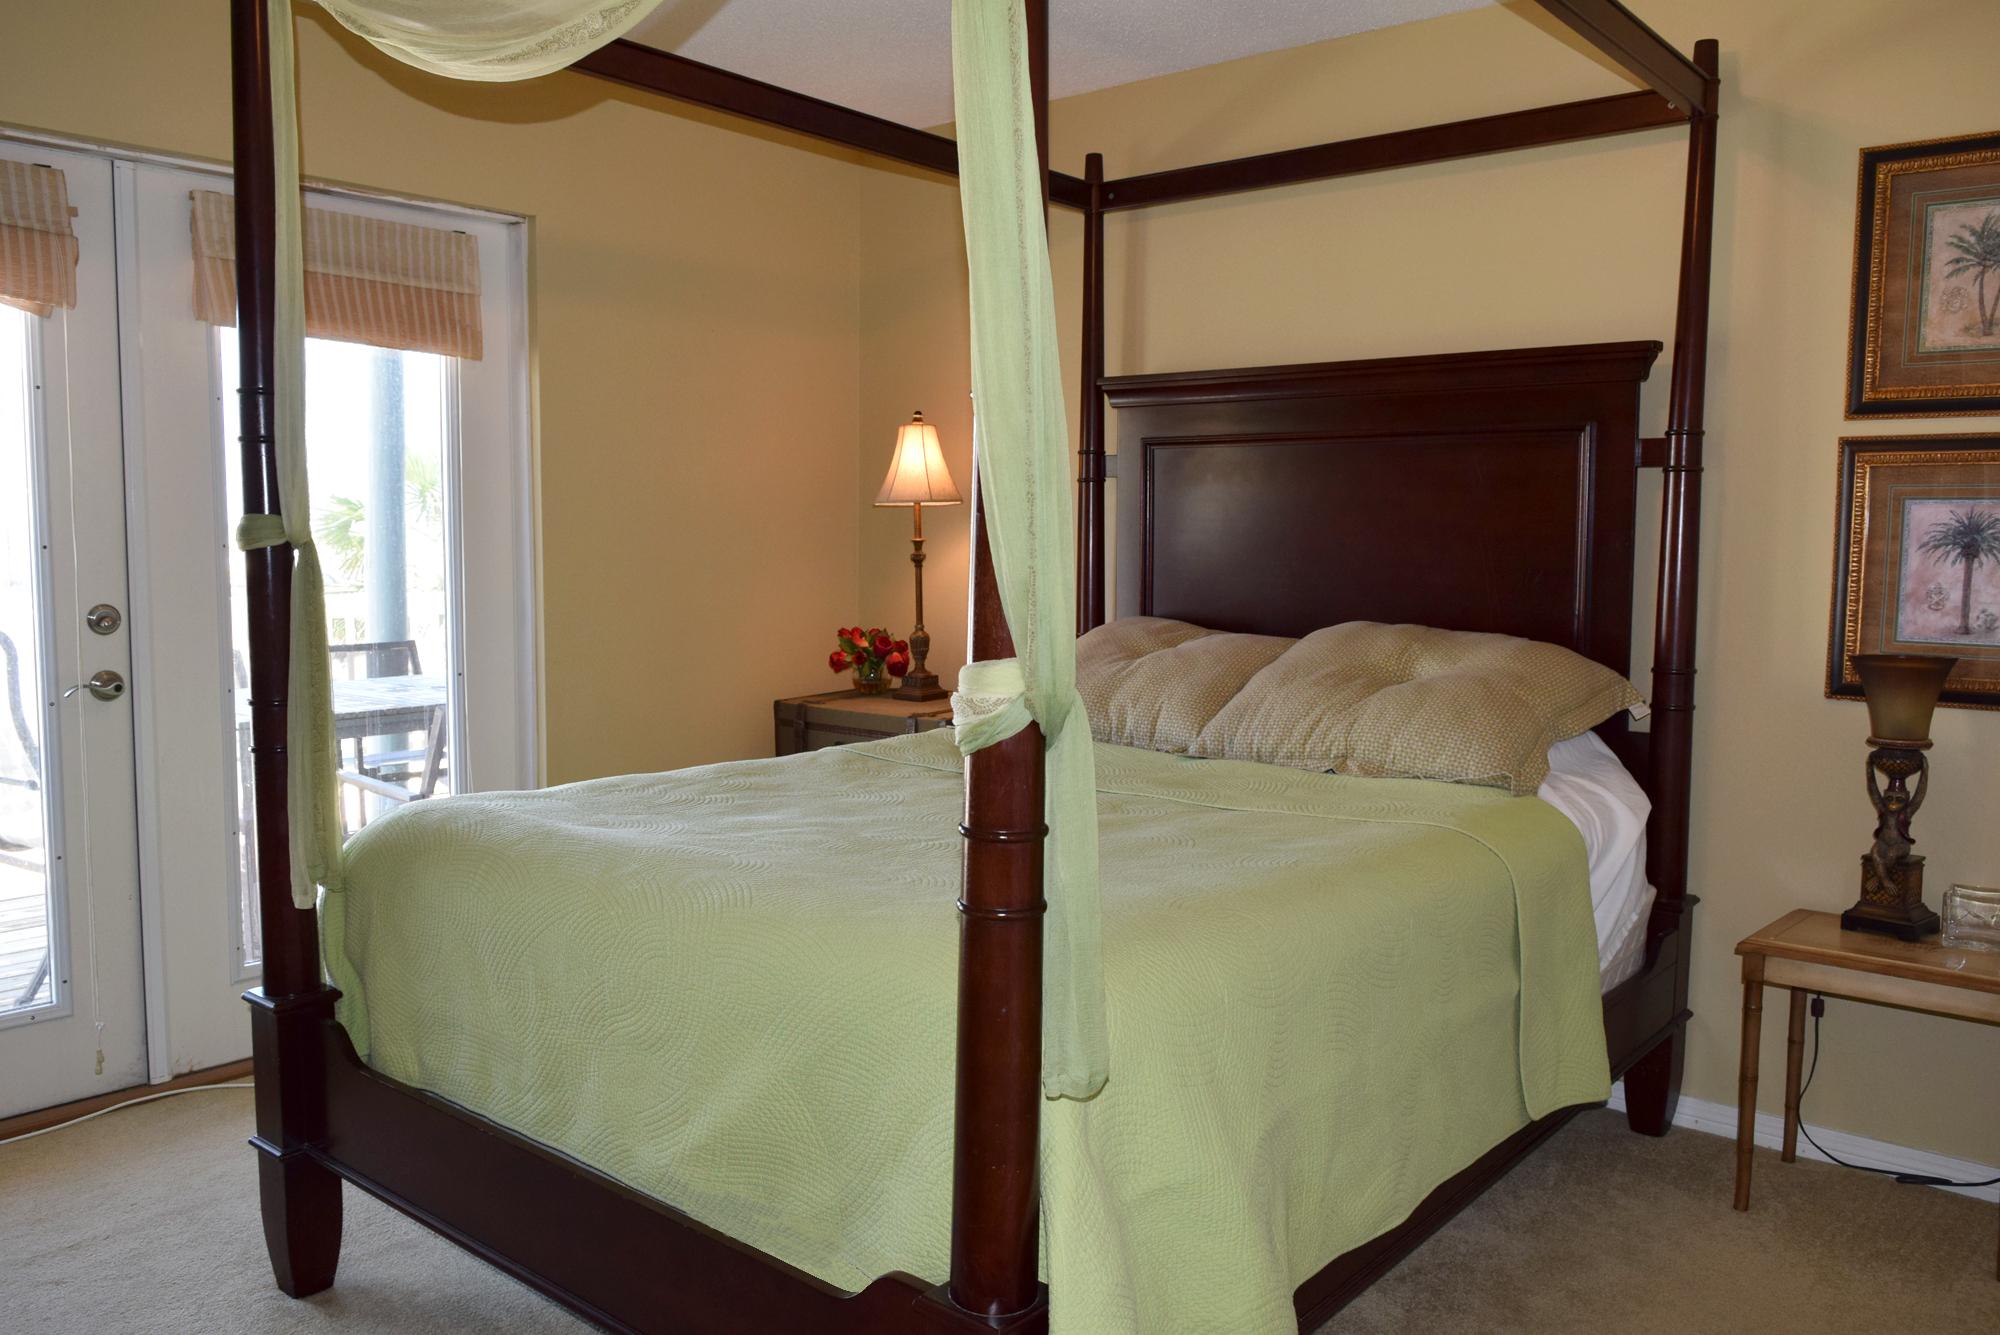 Maldonado 1010 House/Cottage rental in Pensacola Beach House Rentals in Pensacola Beach Florida - #19